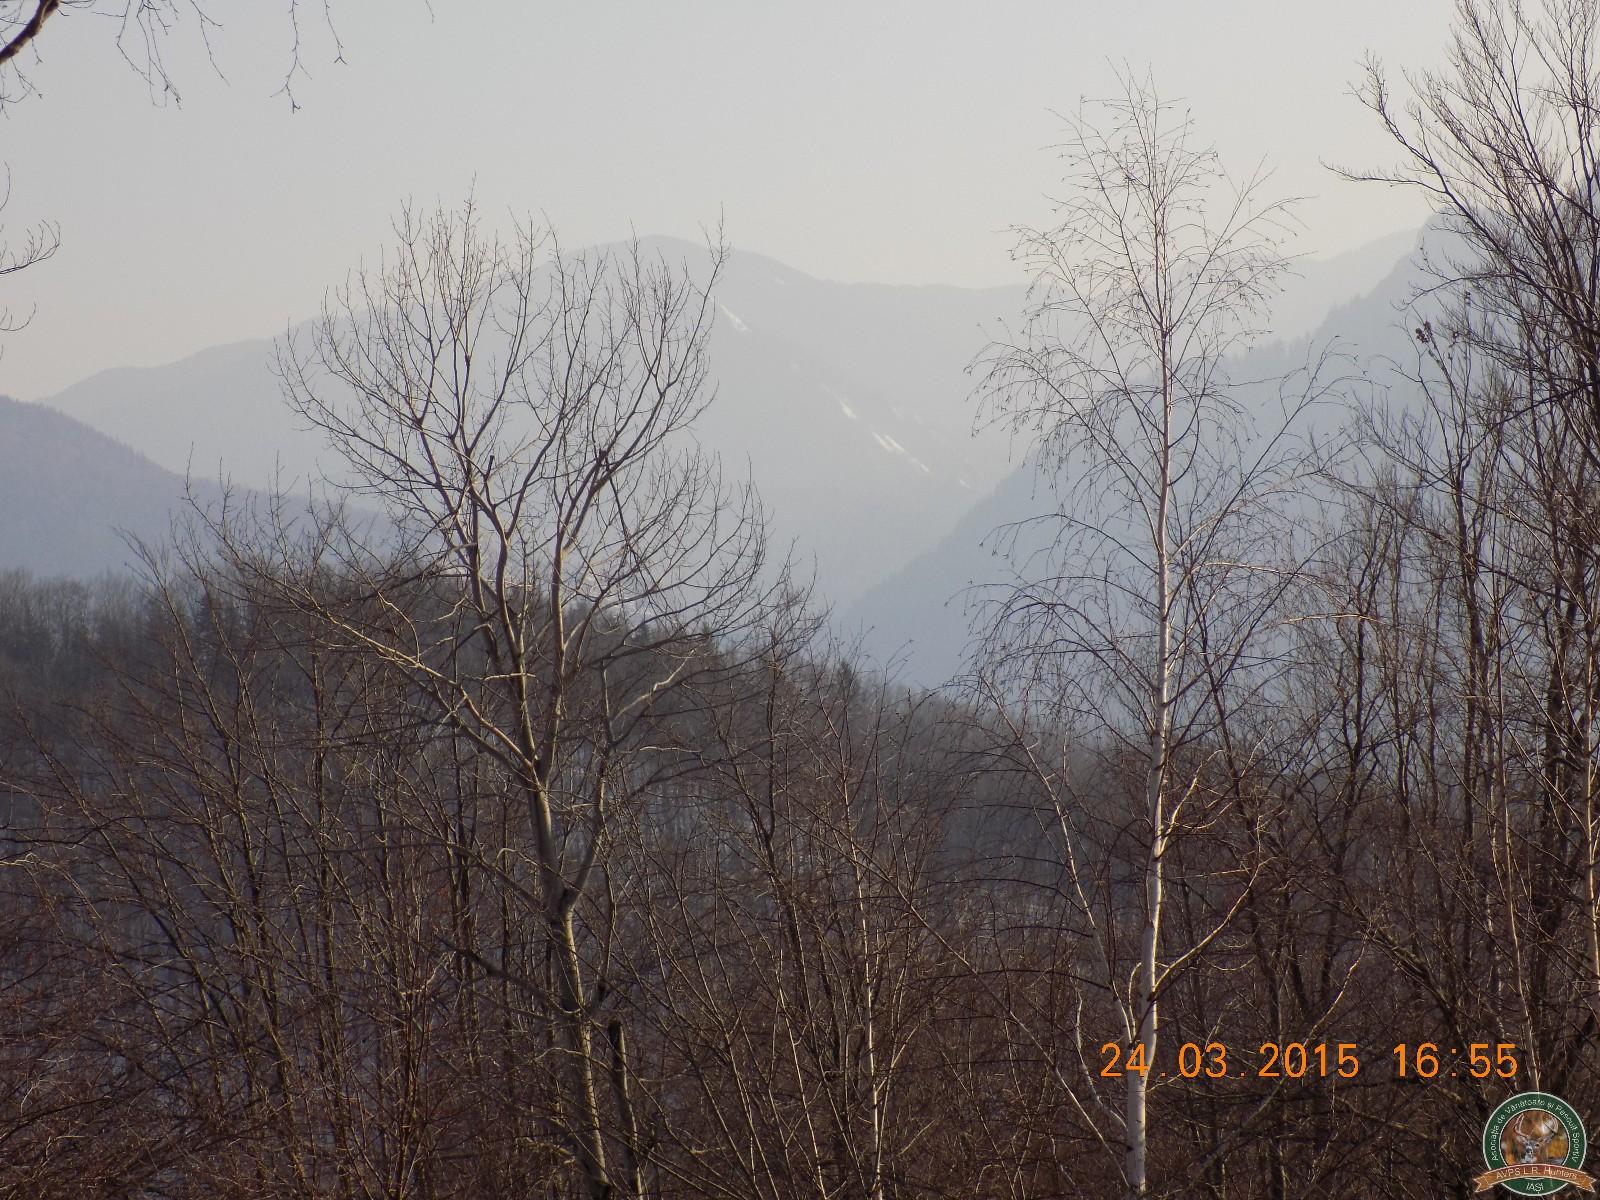 avps-lr-hunters-lepsa_20-46